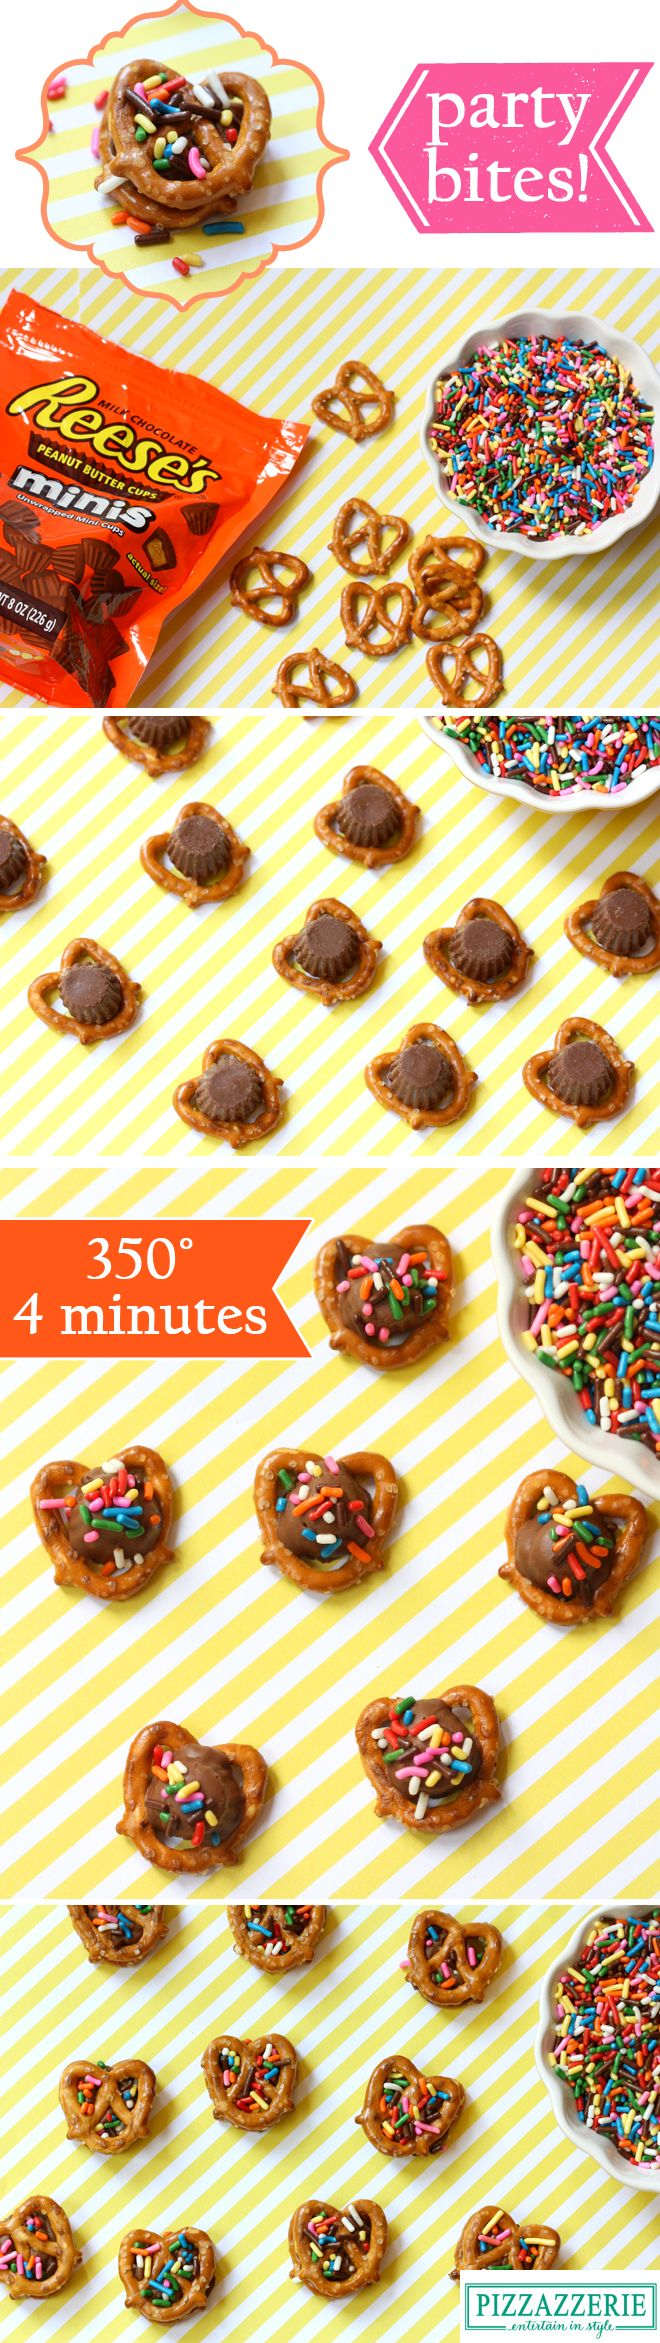 SAVE THIS EASY IDEA!!  EASY PARTY BITES: Chocolate Peanut Butter Pretzel Bites!